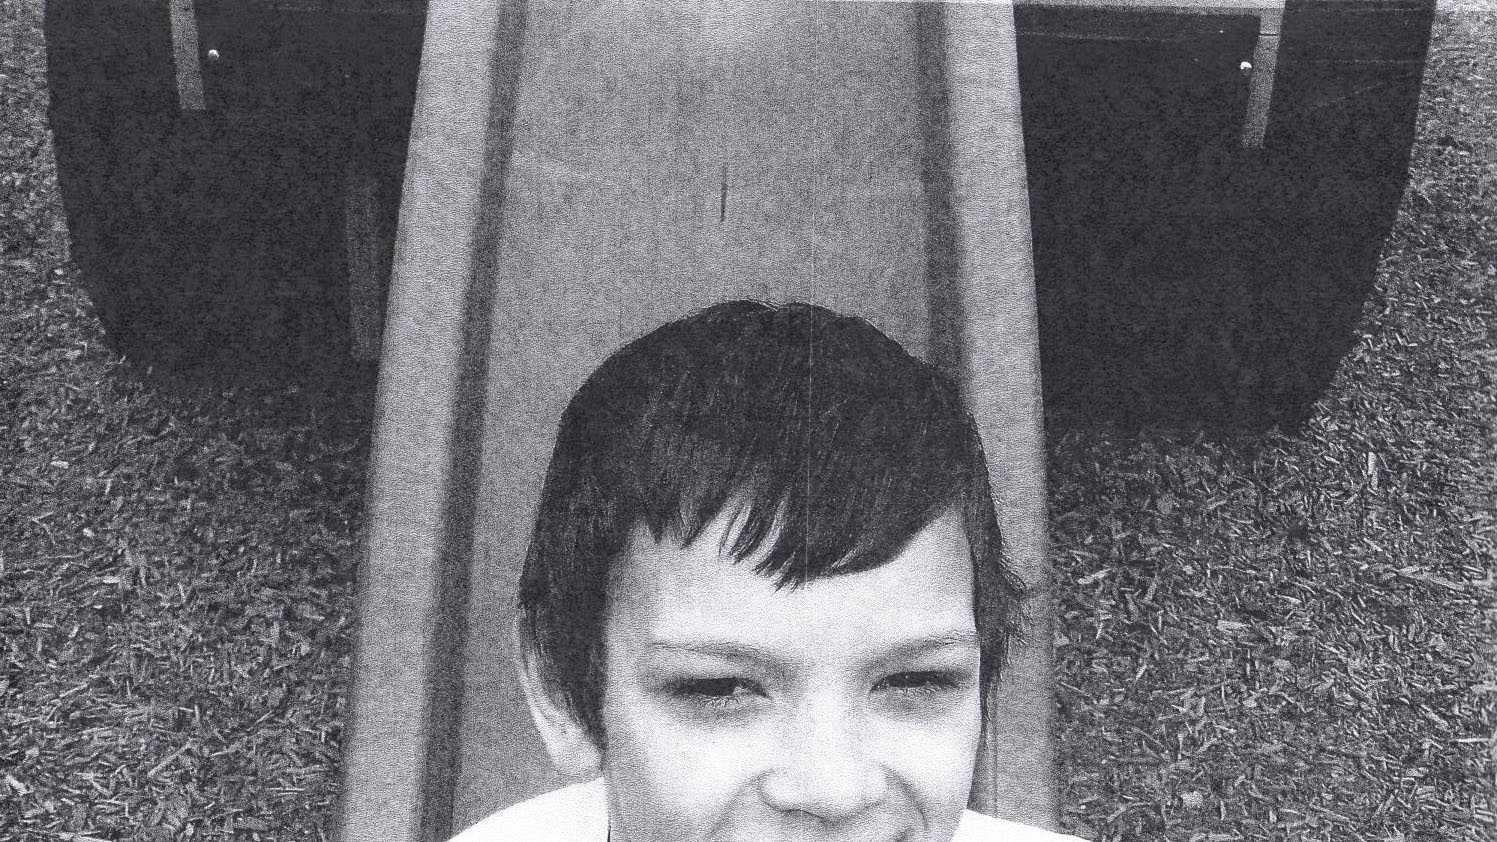 122512 missing boy